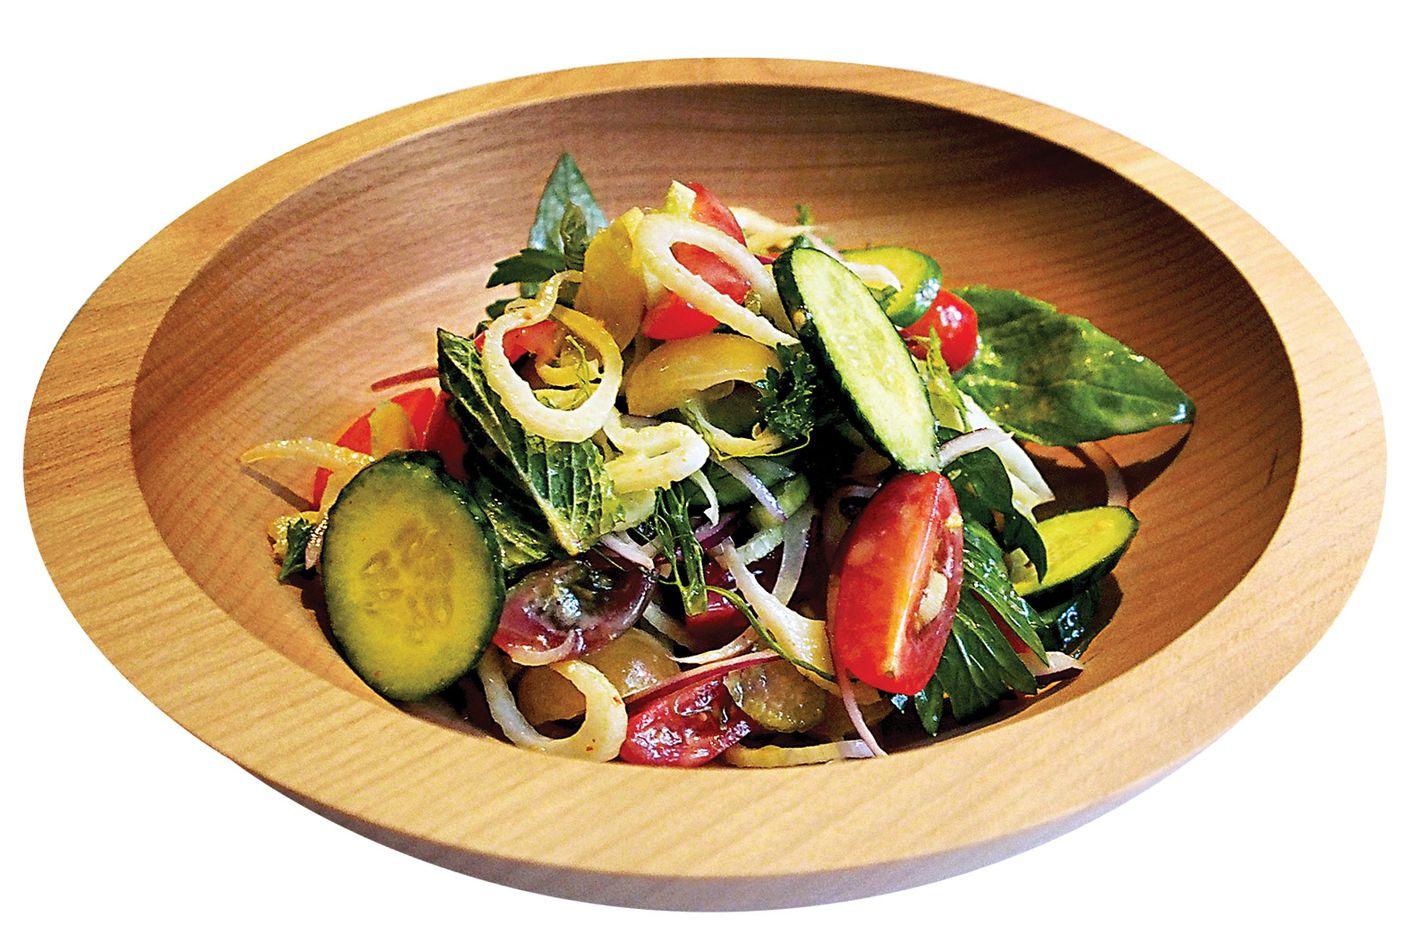 Cucumber-and-radish salad.